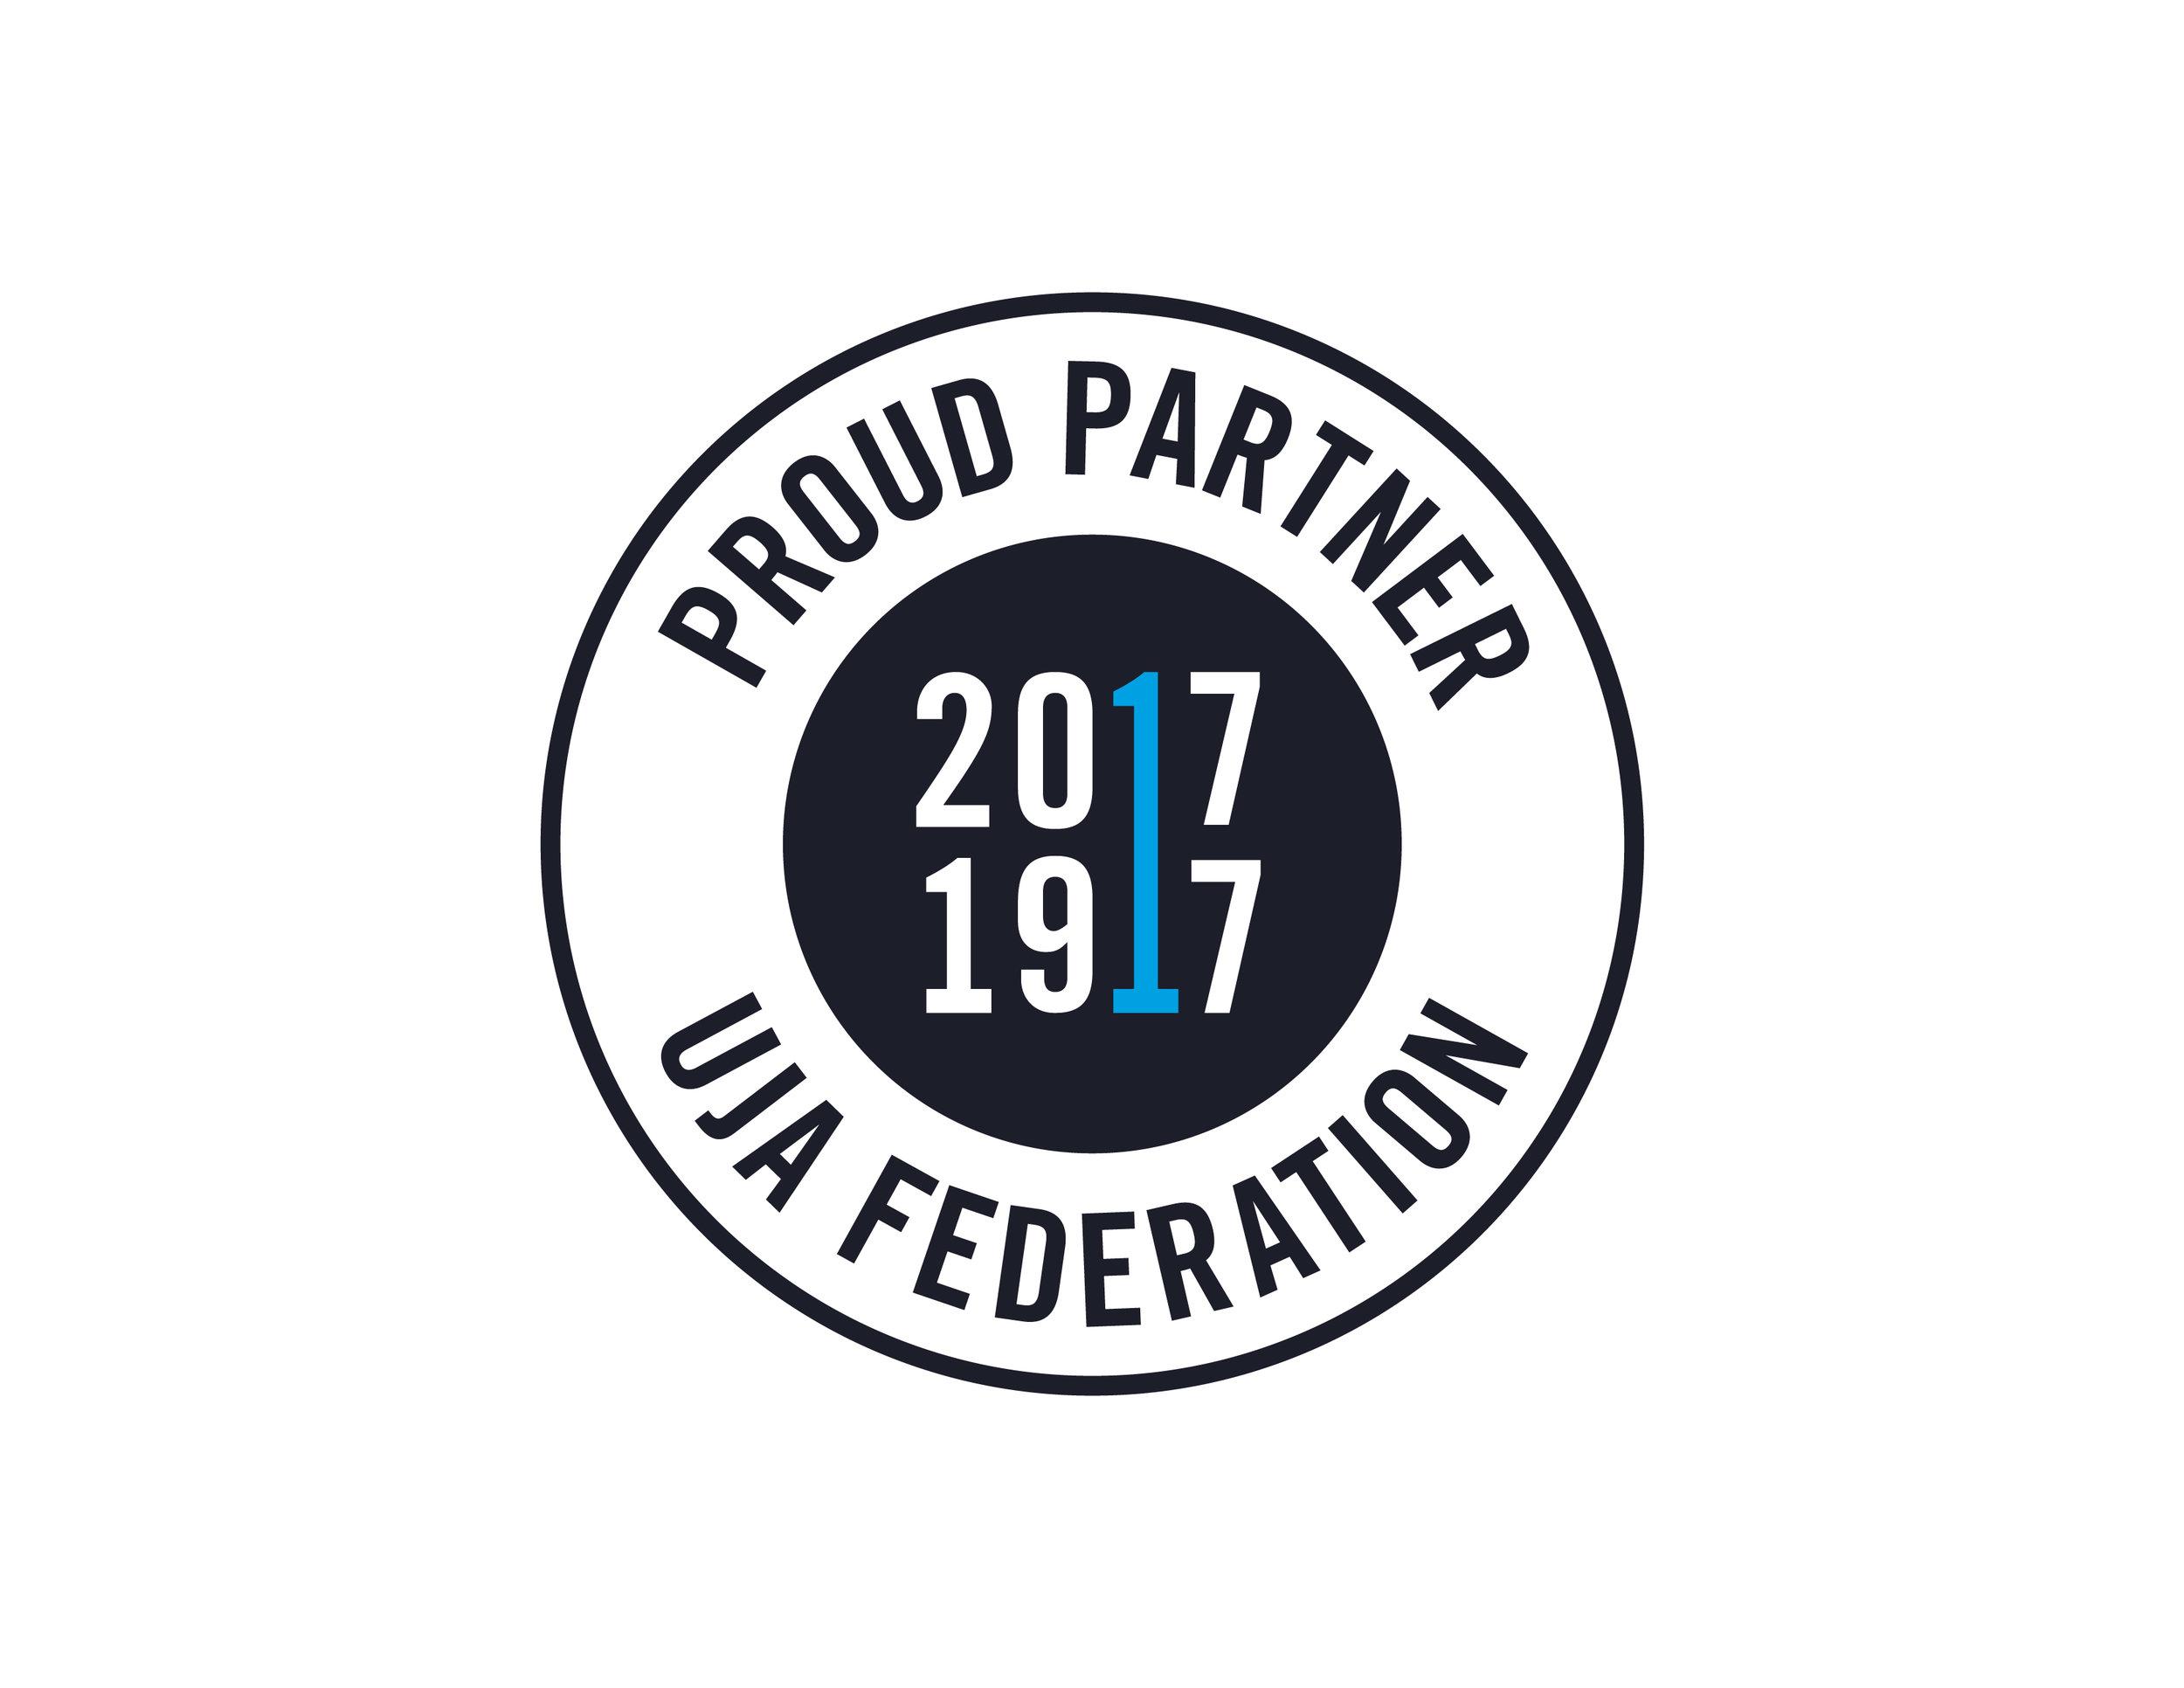 Proud Partner 1917-2017 UJA Federation